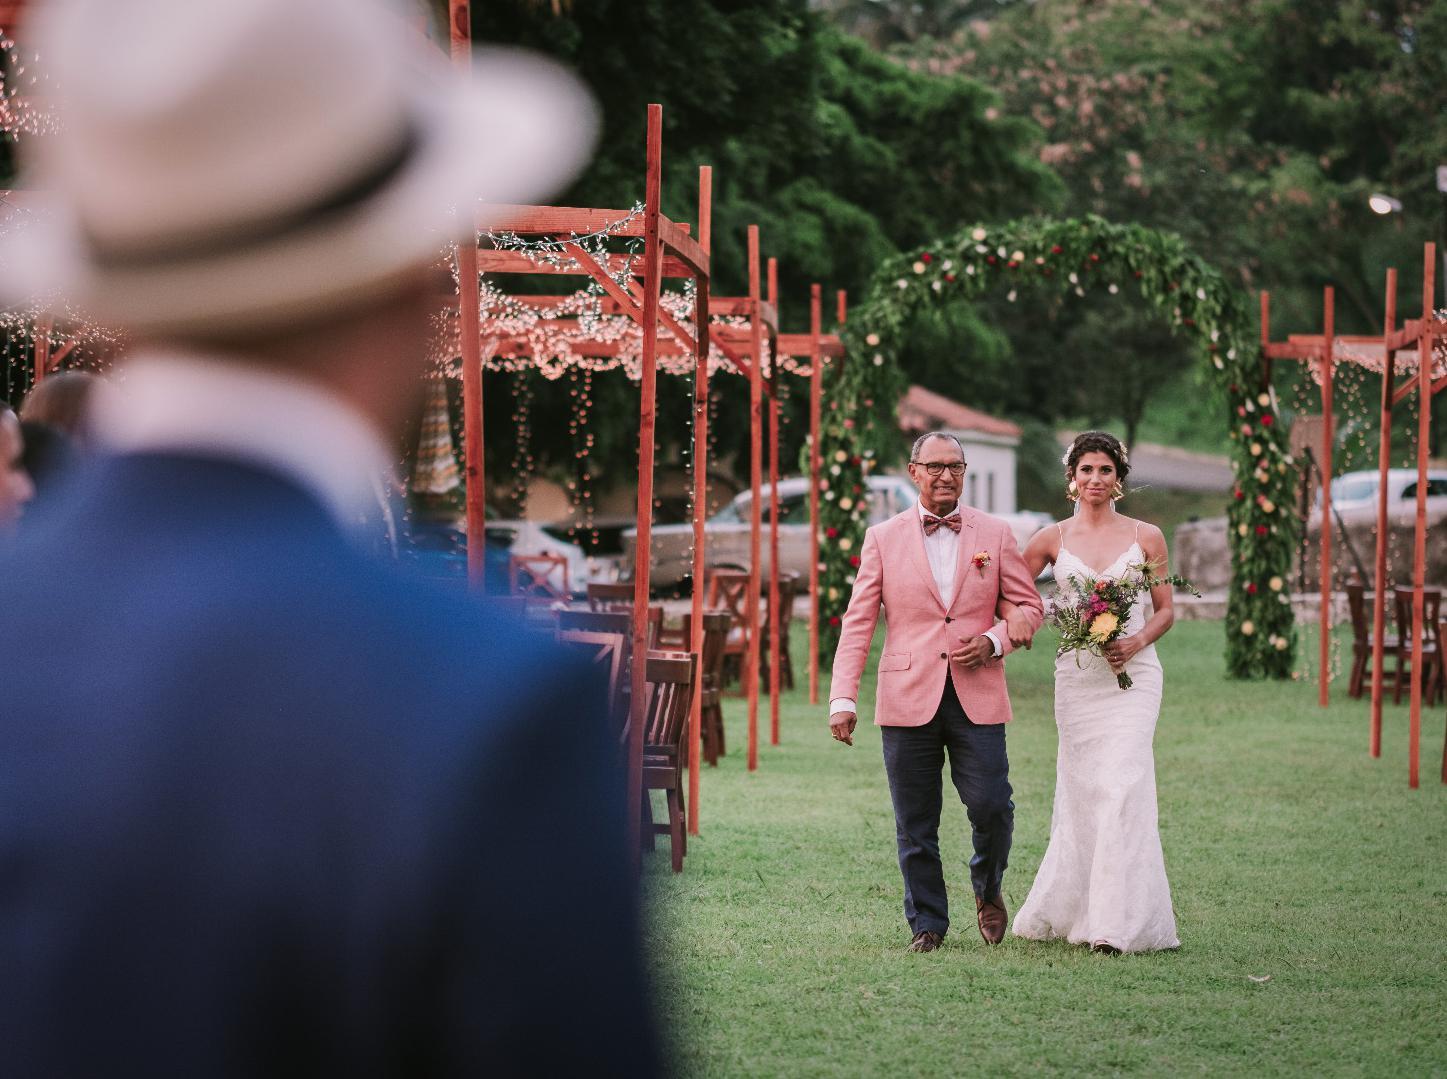 bodas-sin-clasificar-sin-tema-cuba-29281.jpg